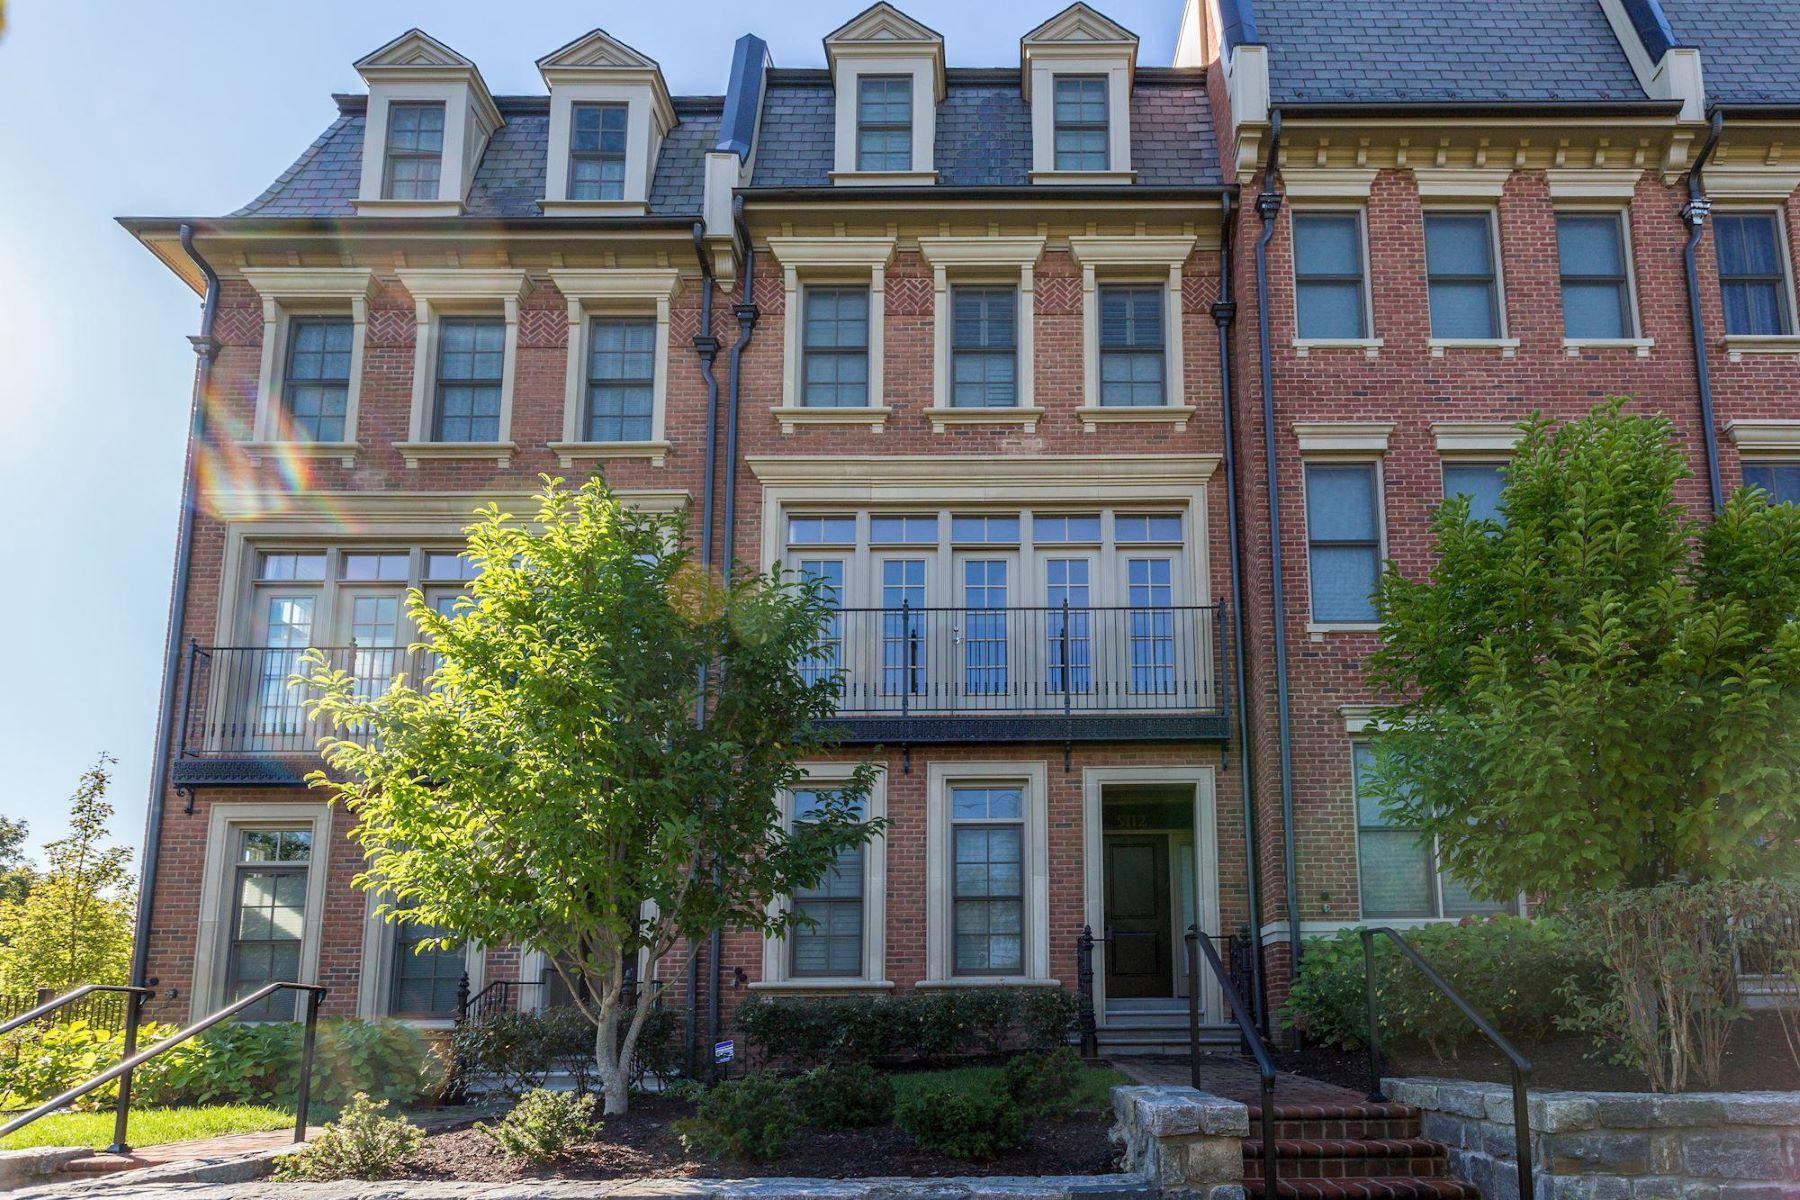 townhouses 为 销售 在 5112 Strathmore Ave 北贝塞斯达, 马里兰州 20852 美国